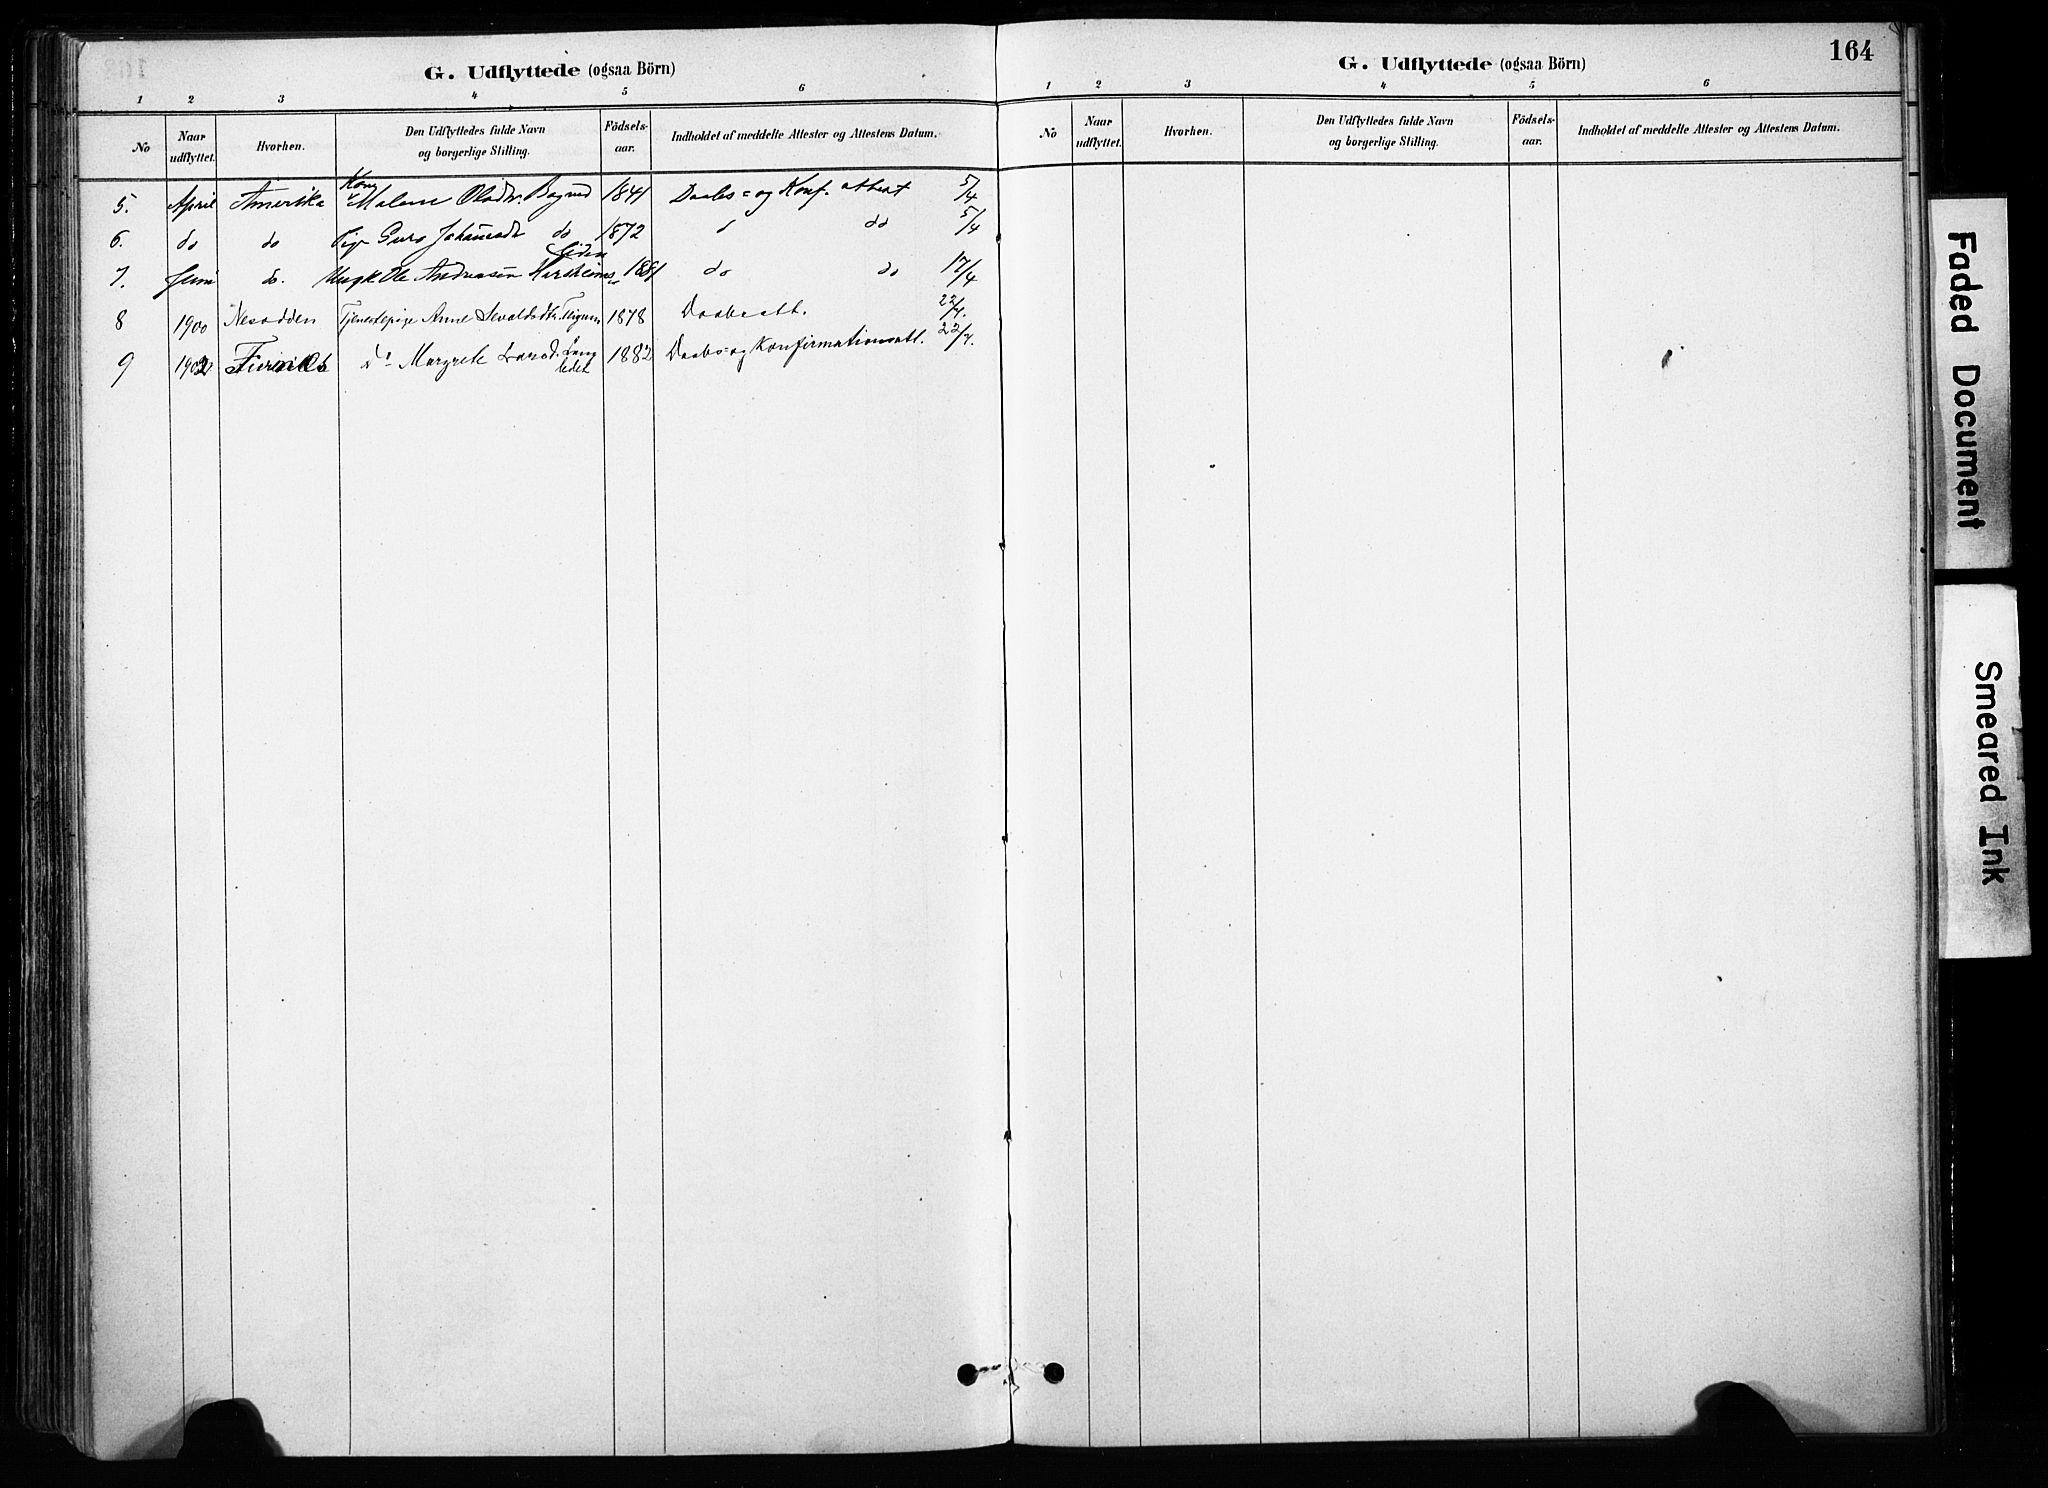 SAH, Skjåk prestekontor, Ministerialbok nr. 4, 1880-1904, s. 164